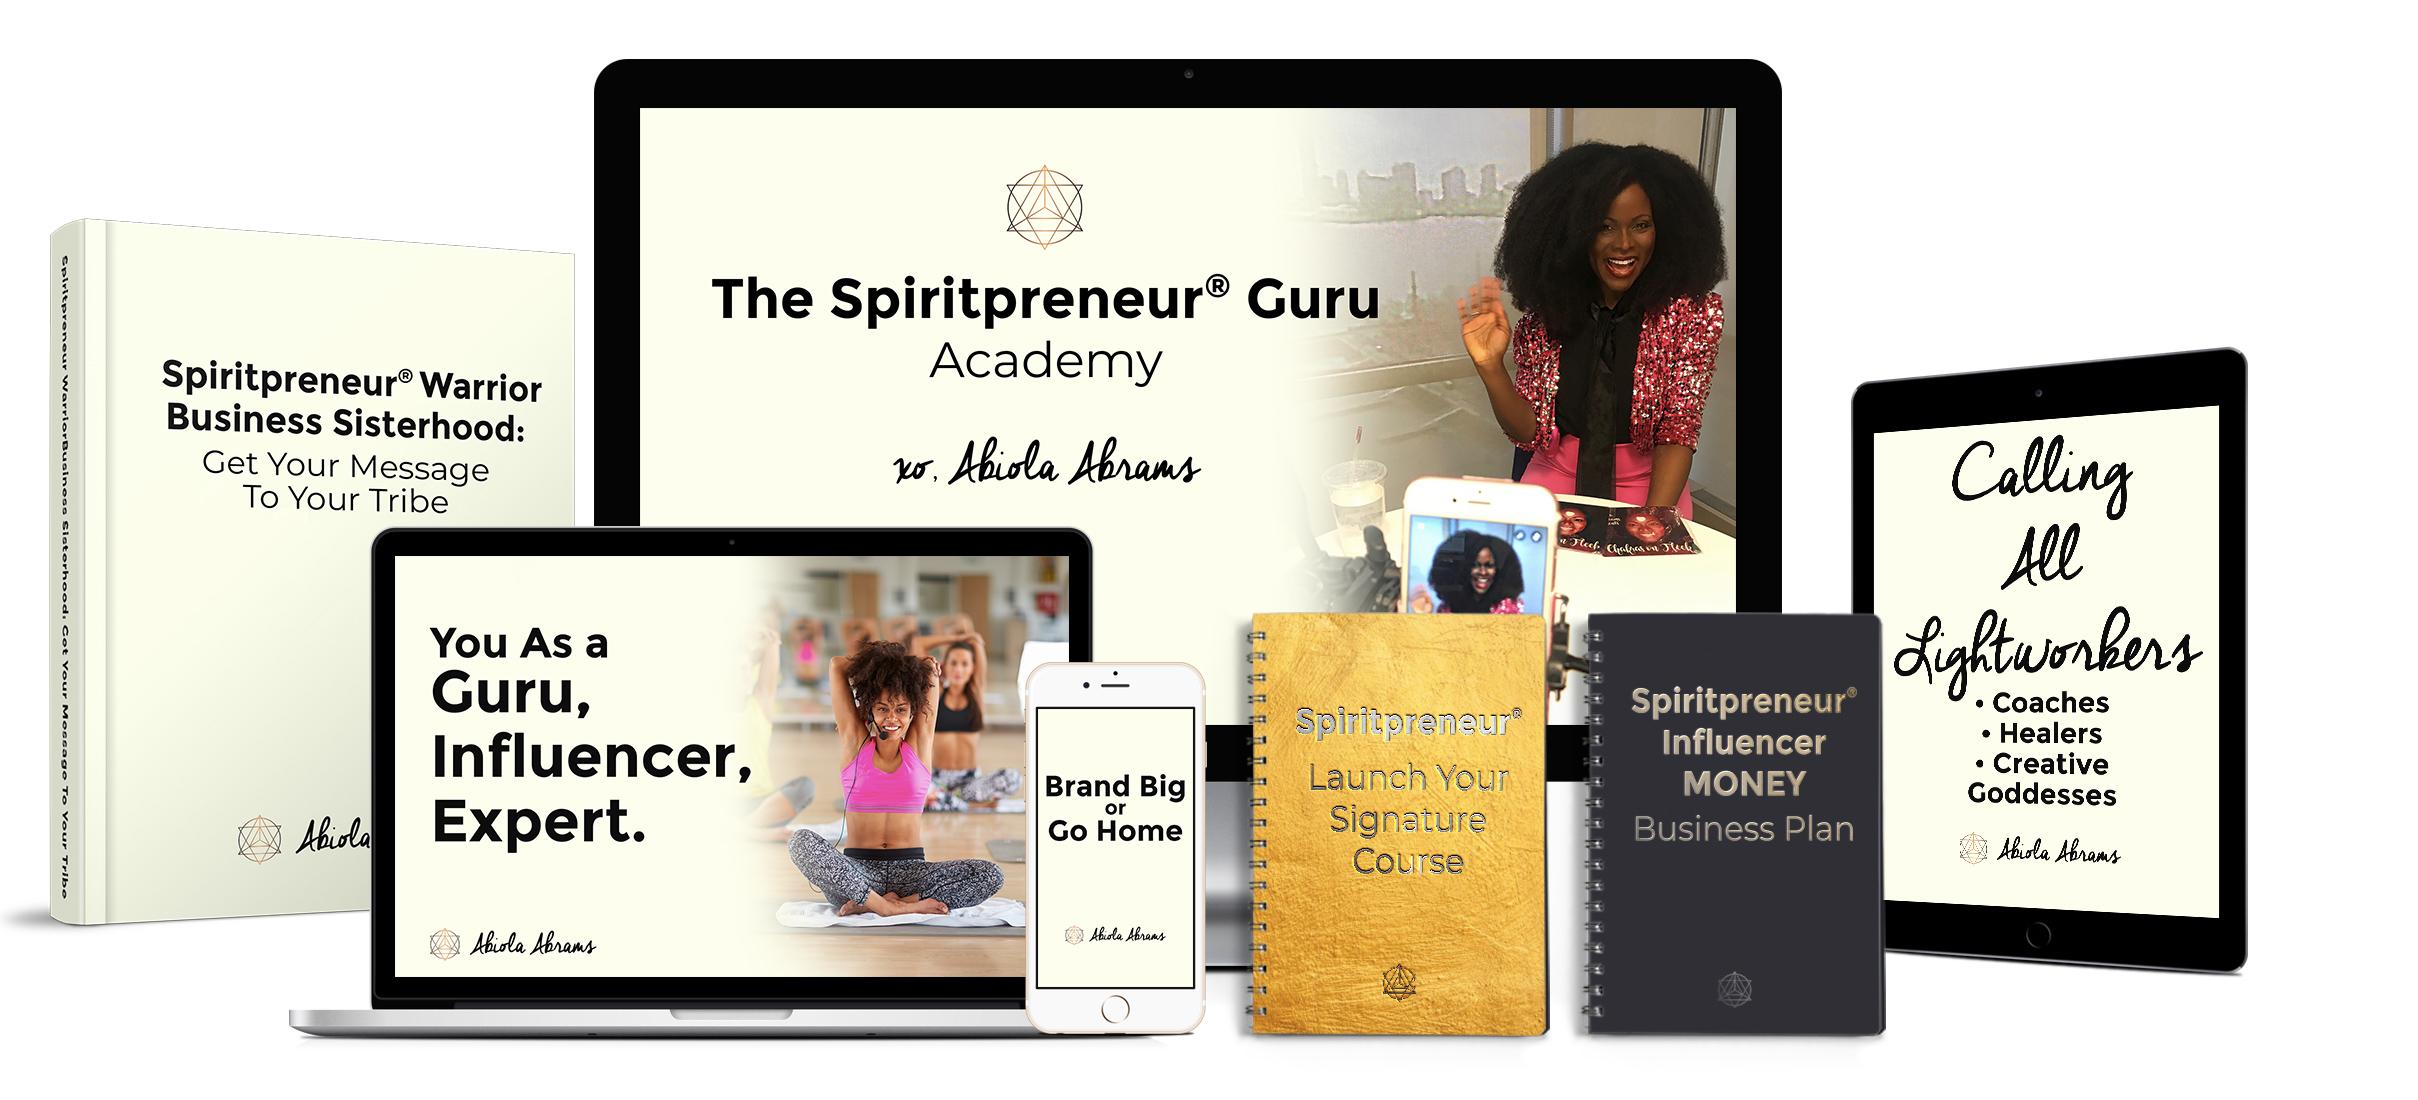 What is The Spiritpreneur Guru Academy for Coaches, Healers, Creatives [Video]